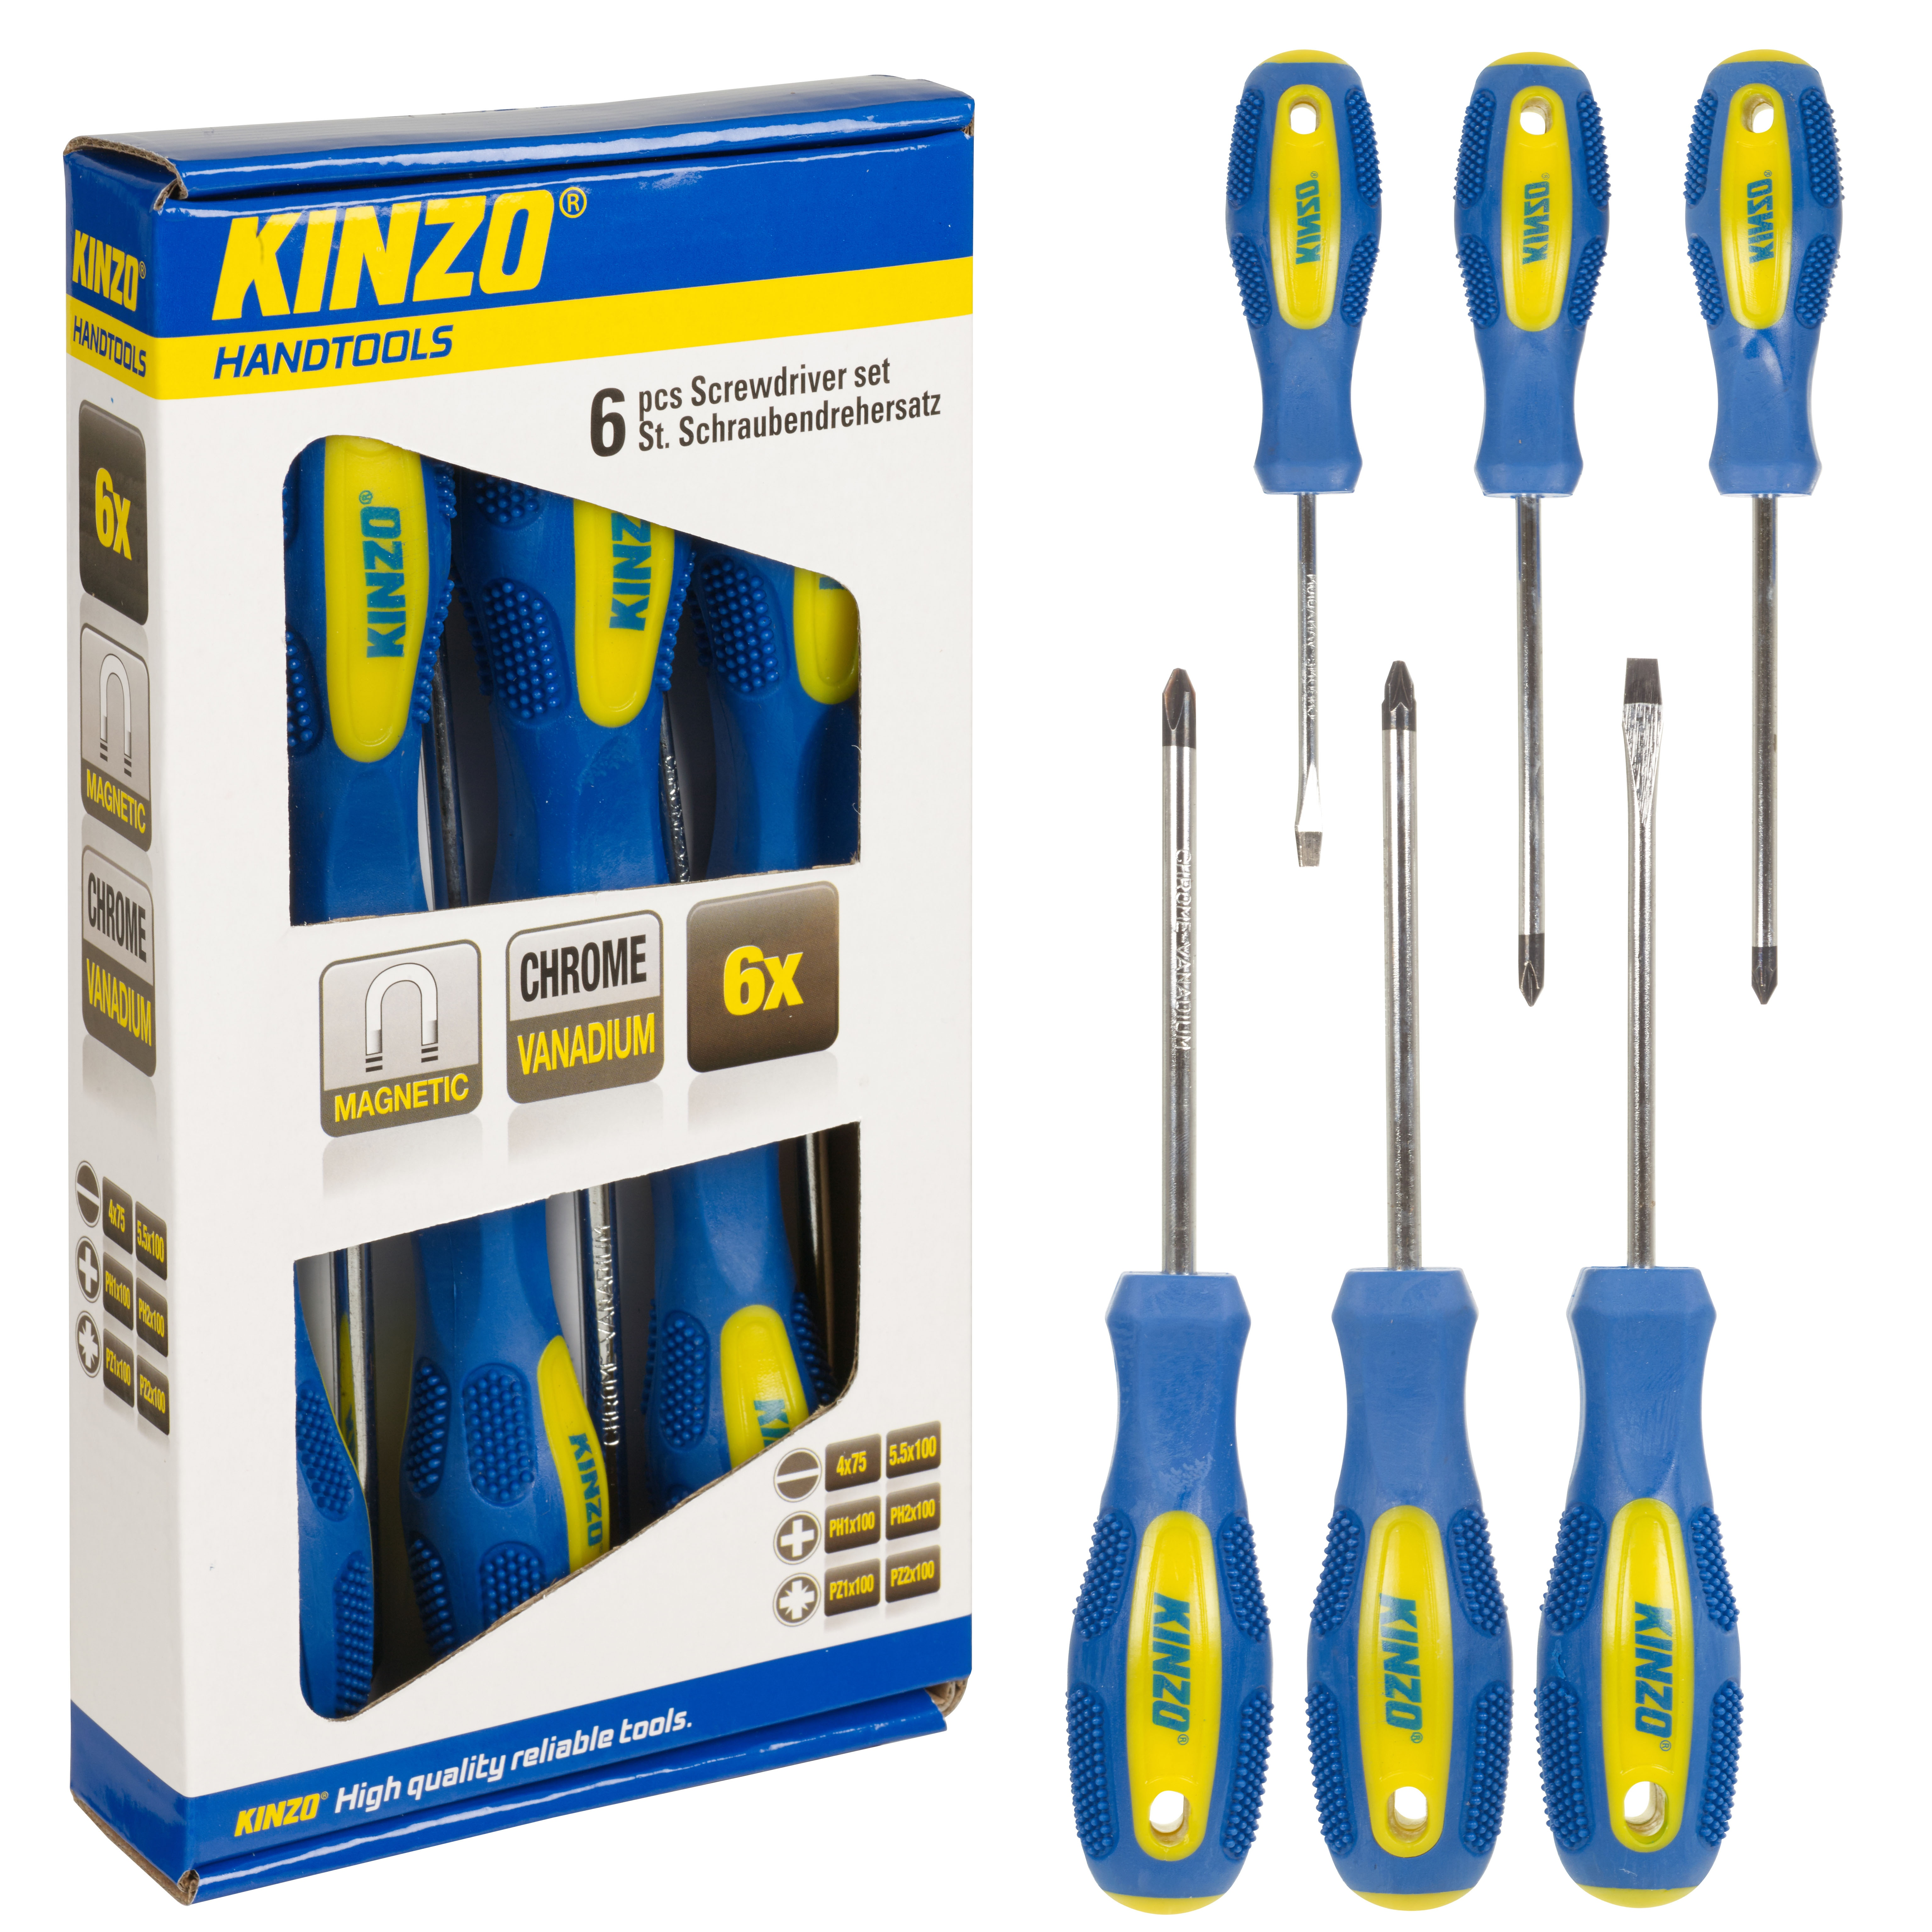 kinzo 6pc screwdriver tool set magnetic tip chrome vanadium philips flat slotted ebay. Black Bedroom Furniture Sets. Home Design Ideas